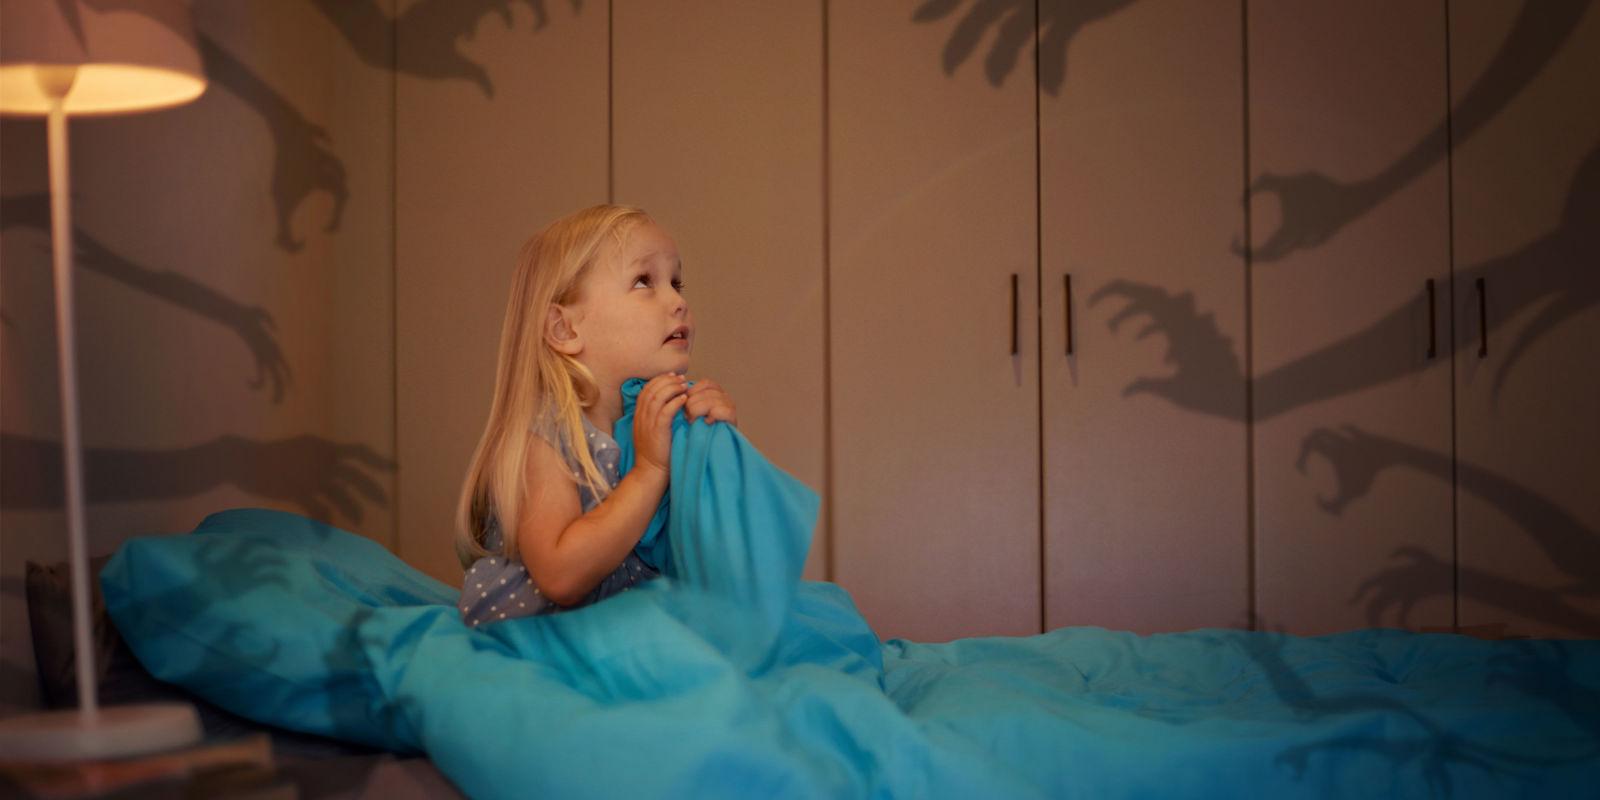 nightmares in preschoolers frequent nightmares you might be sleeping much 966